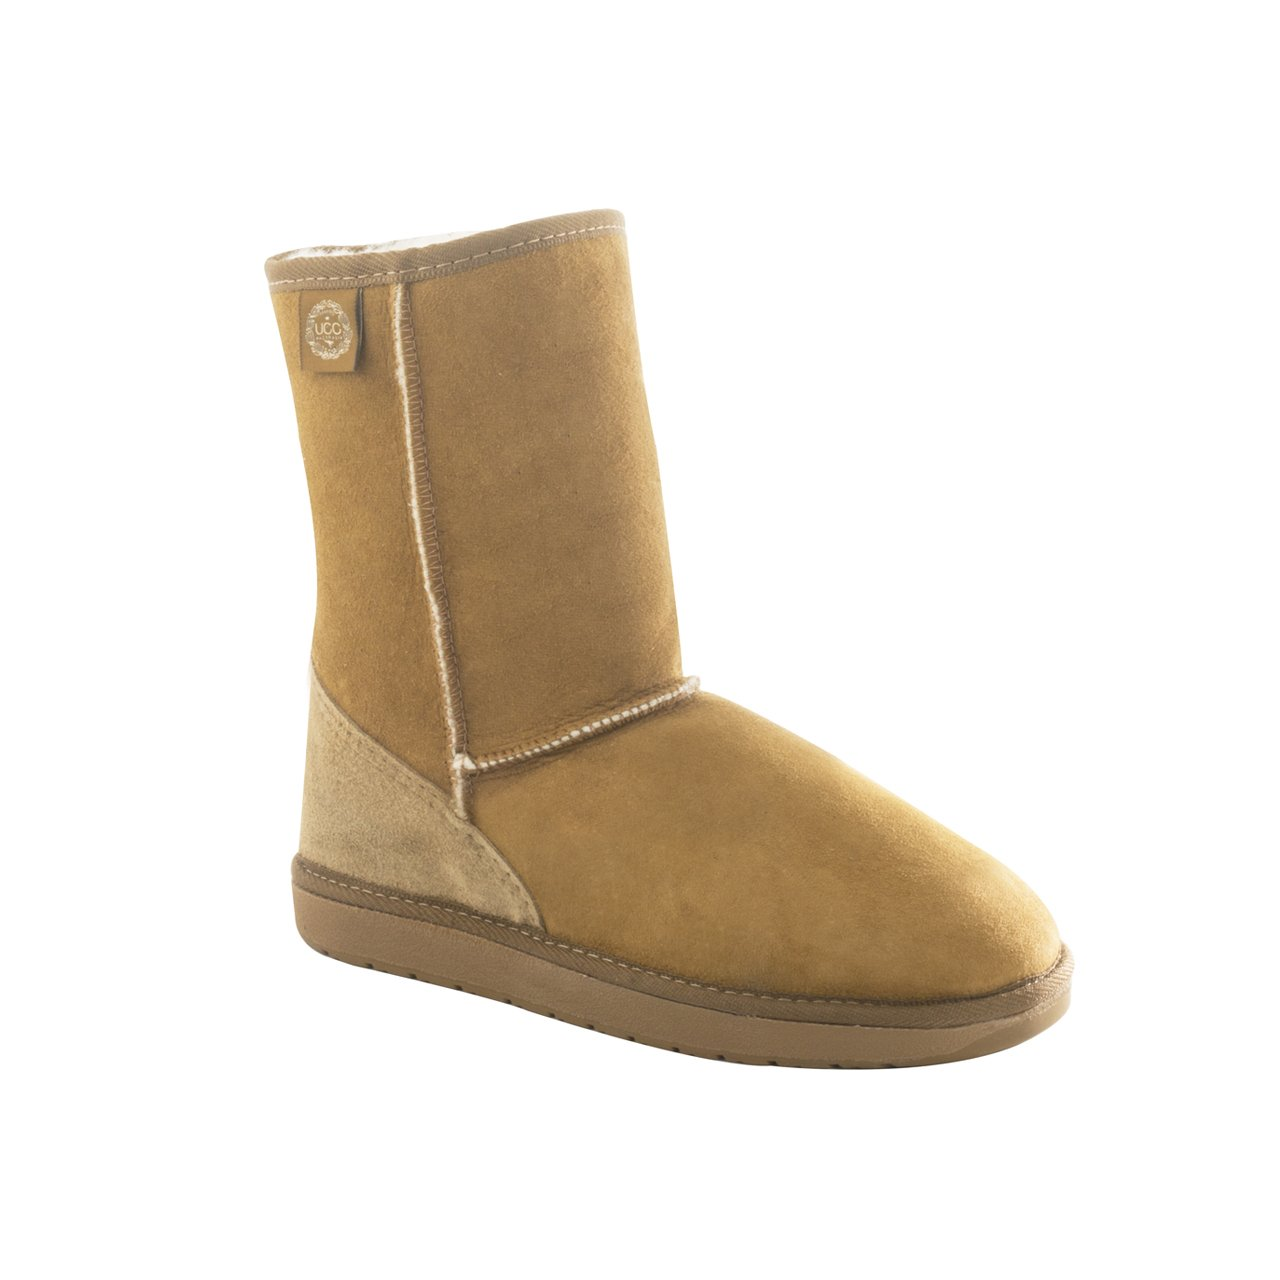 Ugg Australia — Tidal Ugg Boots for